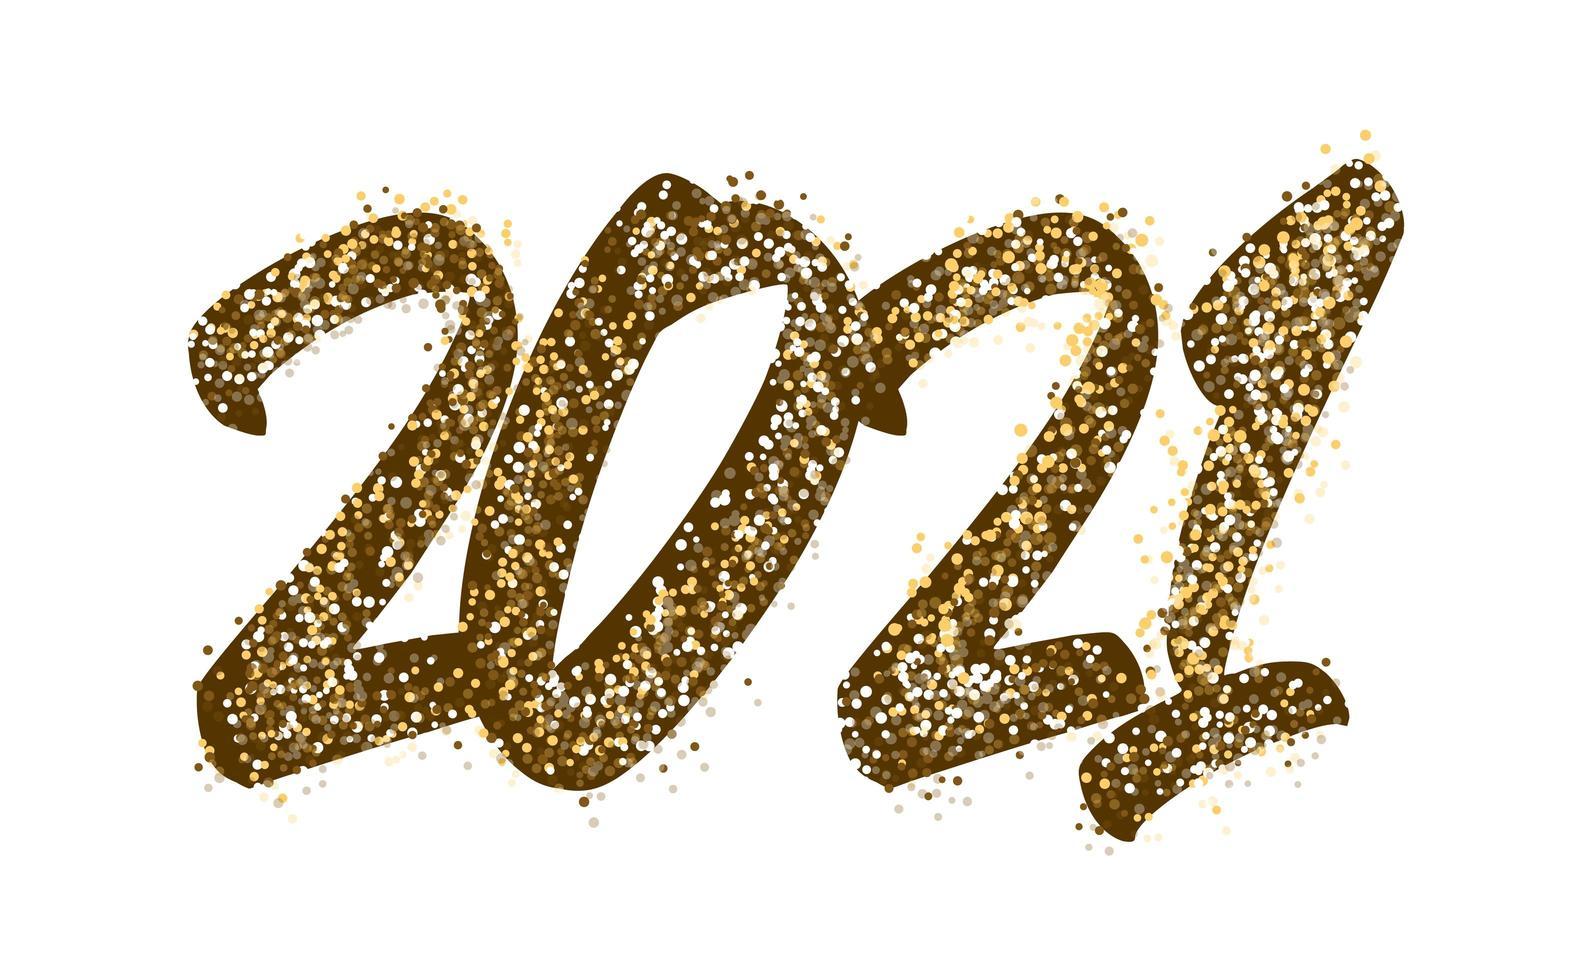 2021 golden funkelnde Typografie vektor